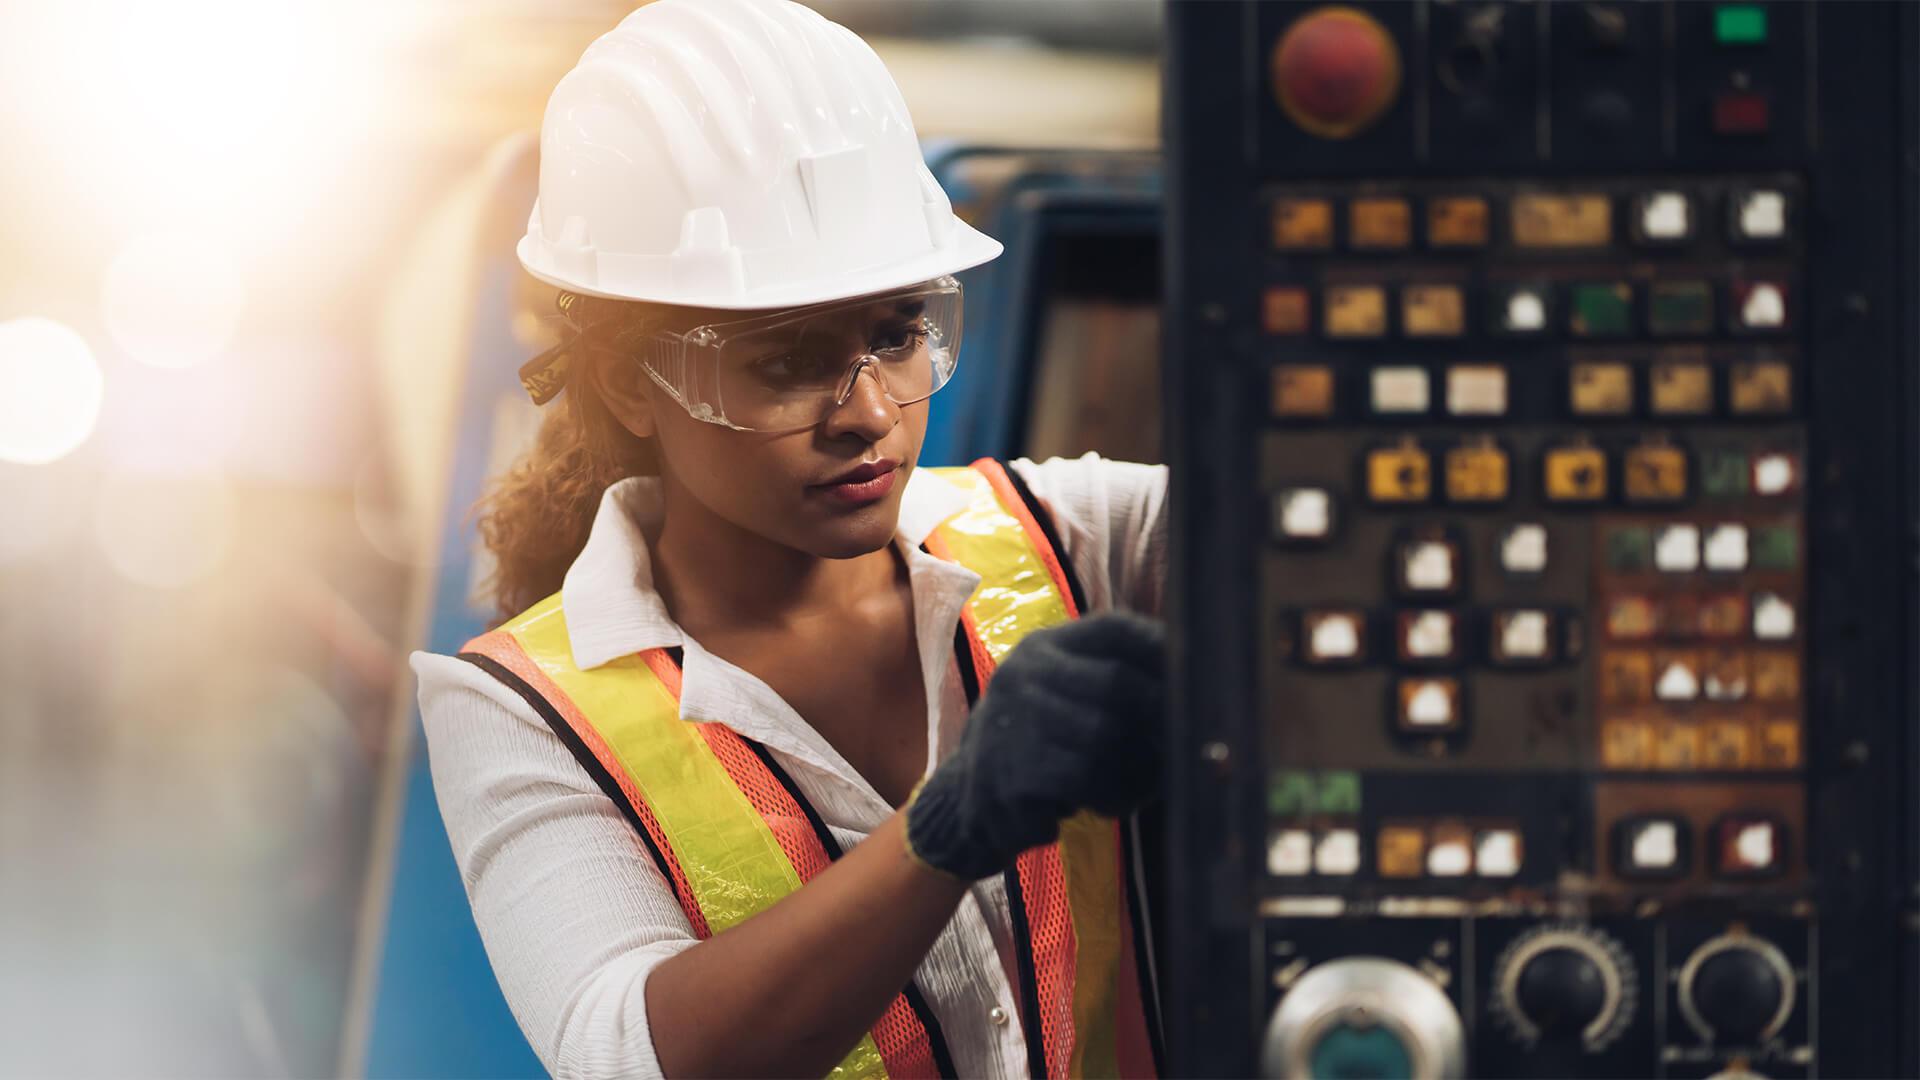 Engineer inspecting construction equipment